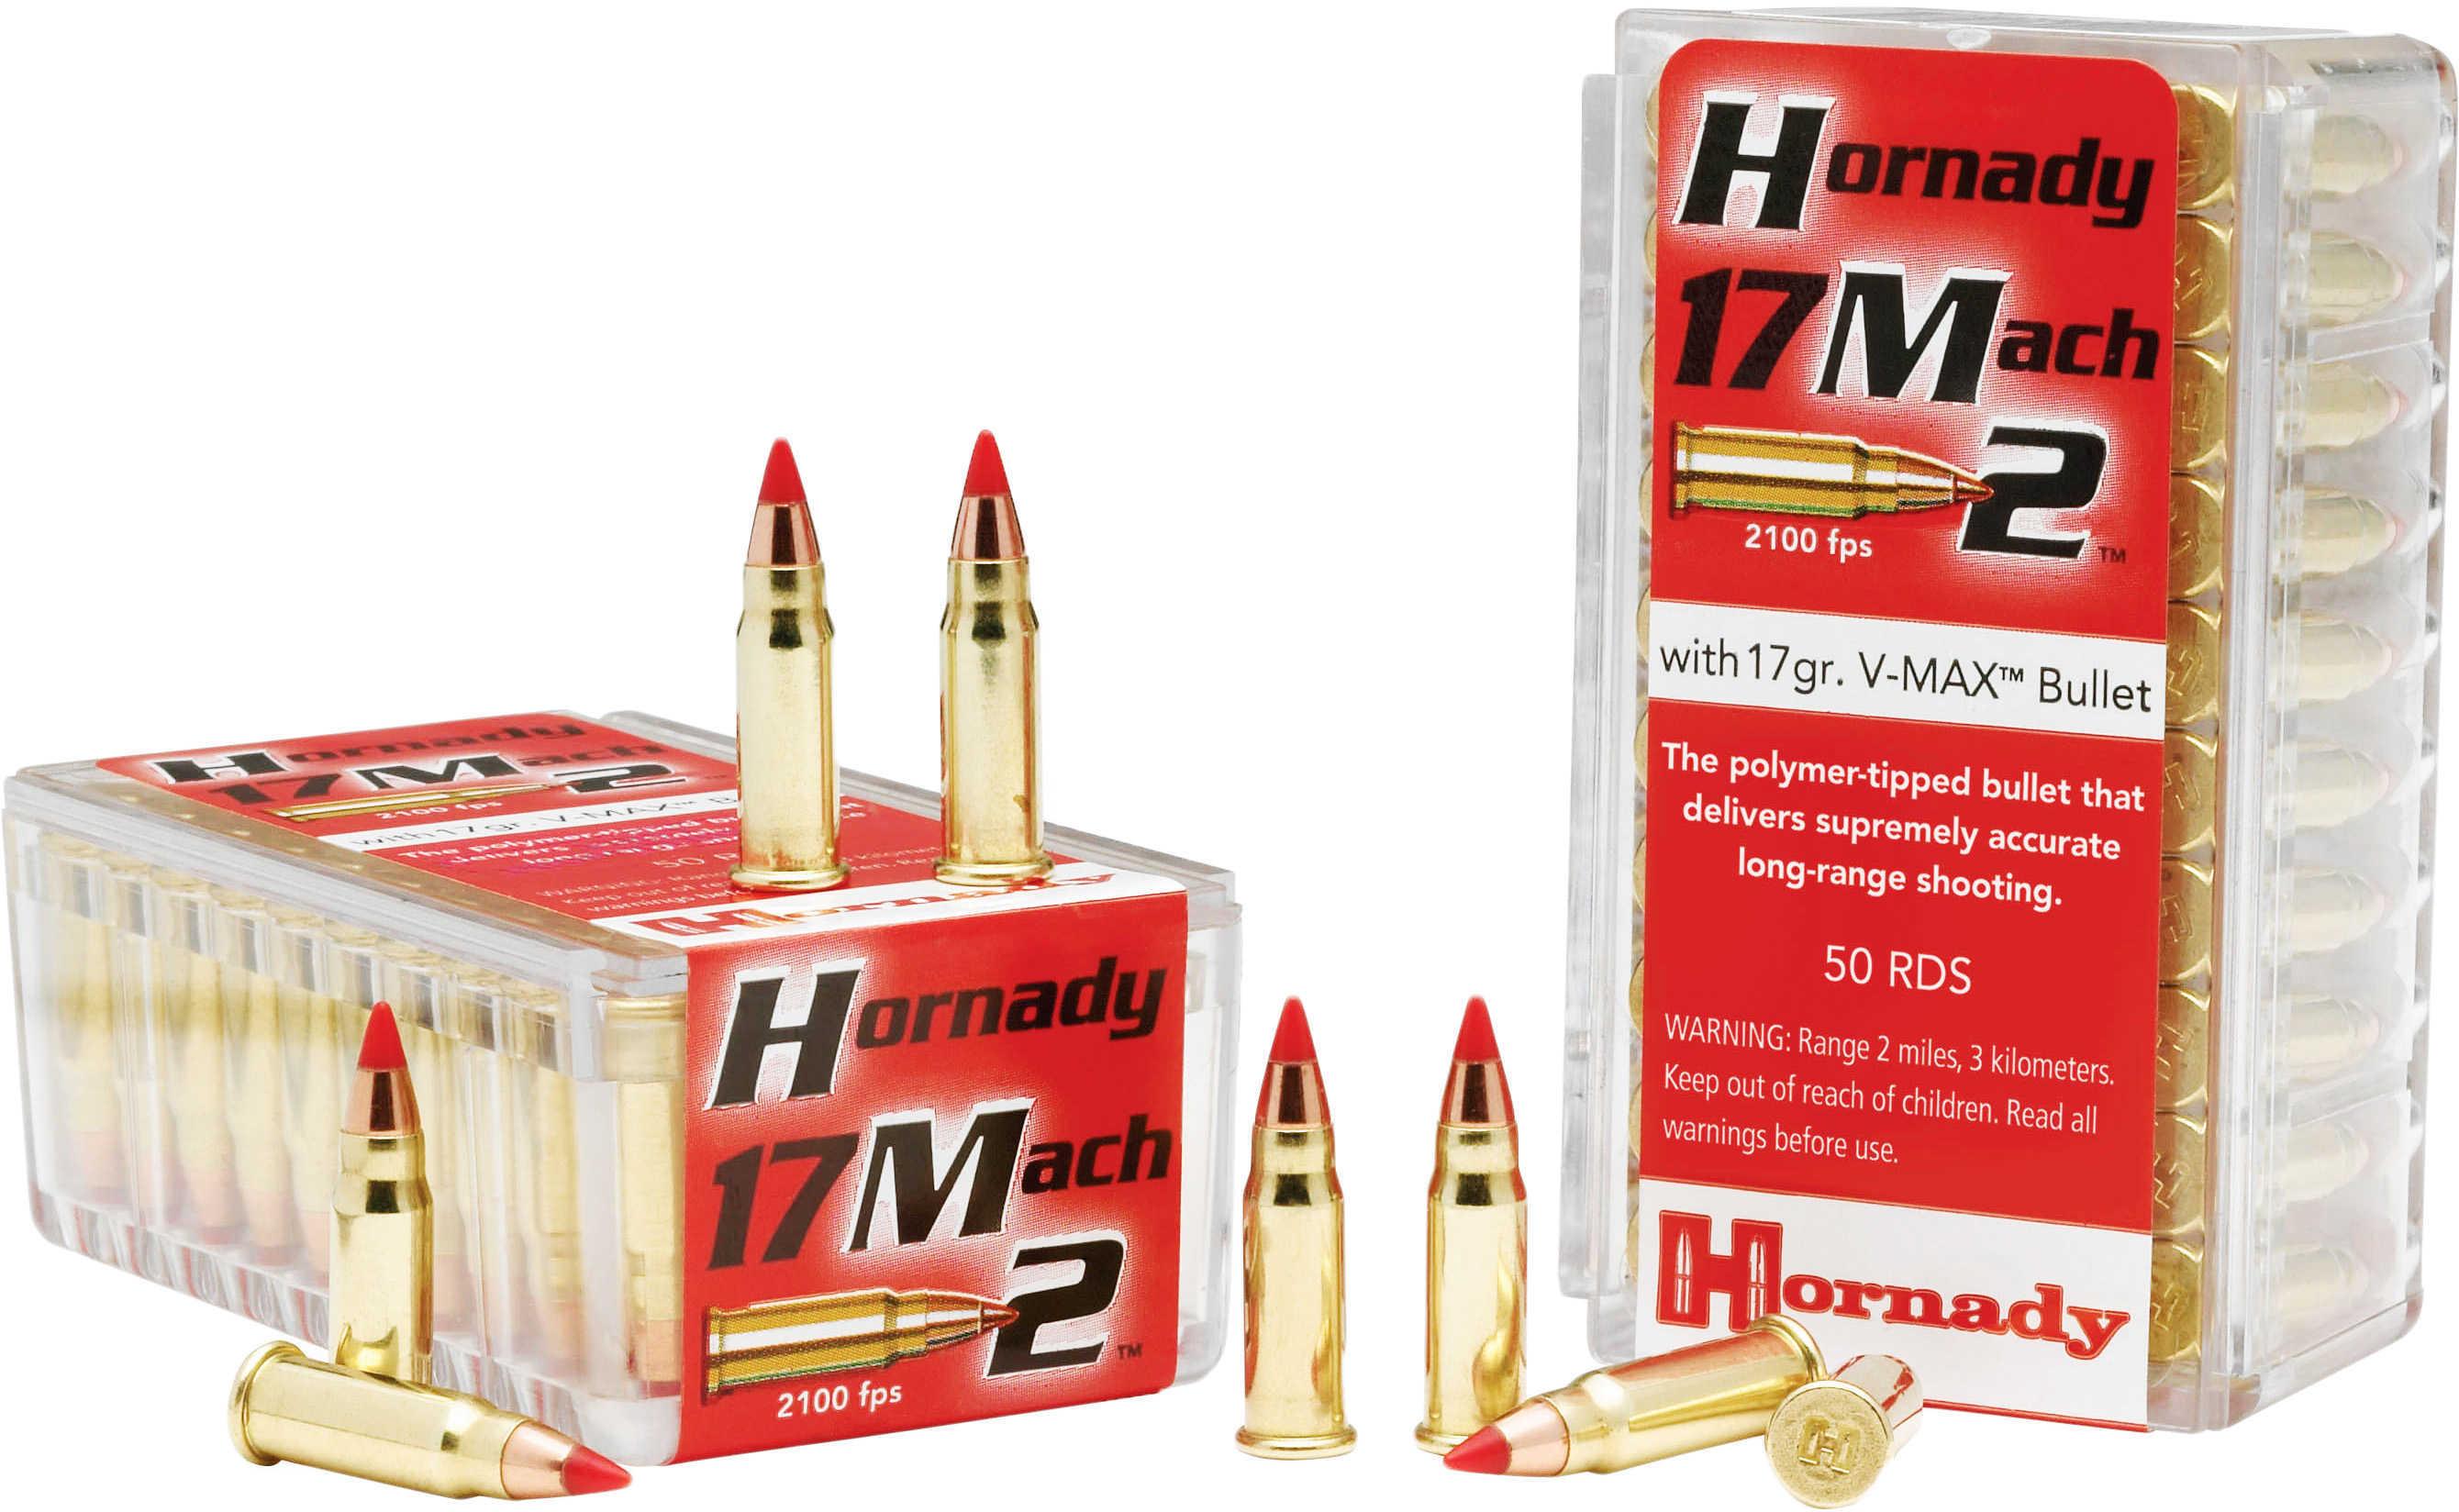 Hornady 17 Mach 2 17 Grain V-Max Ammunition 50 Rounds Per Box Md: 83177